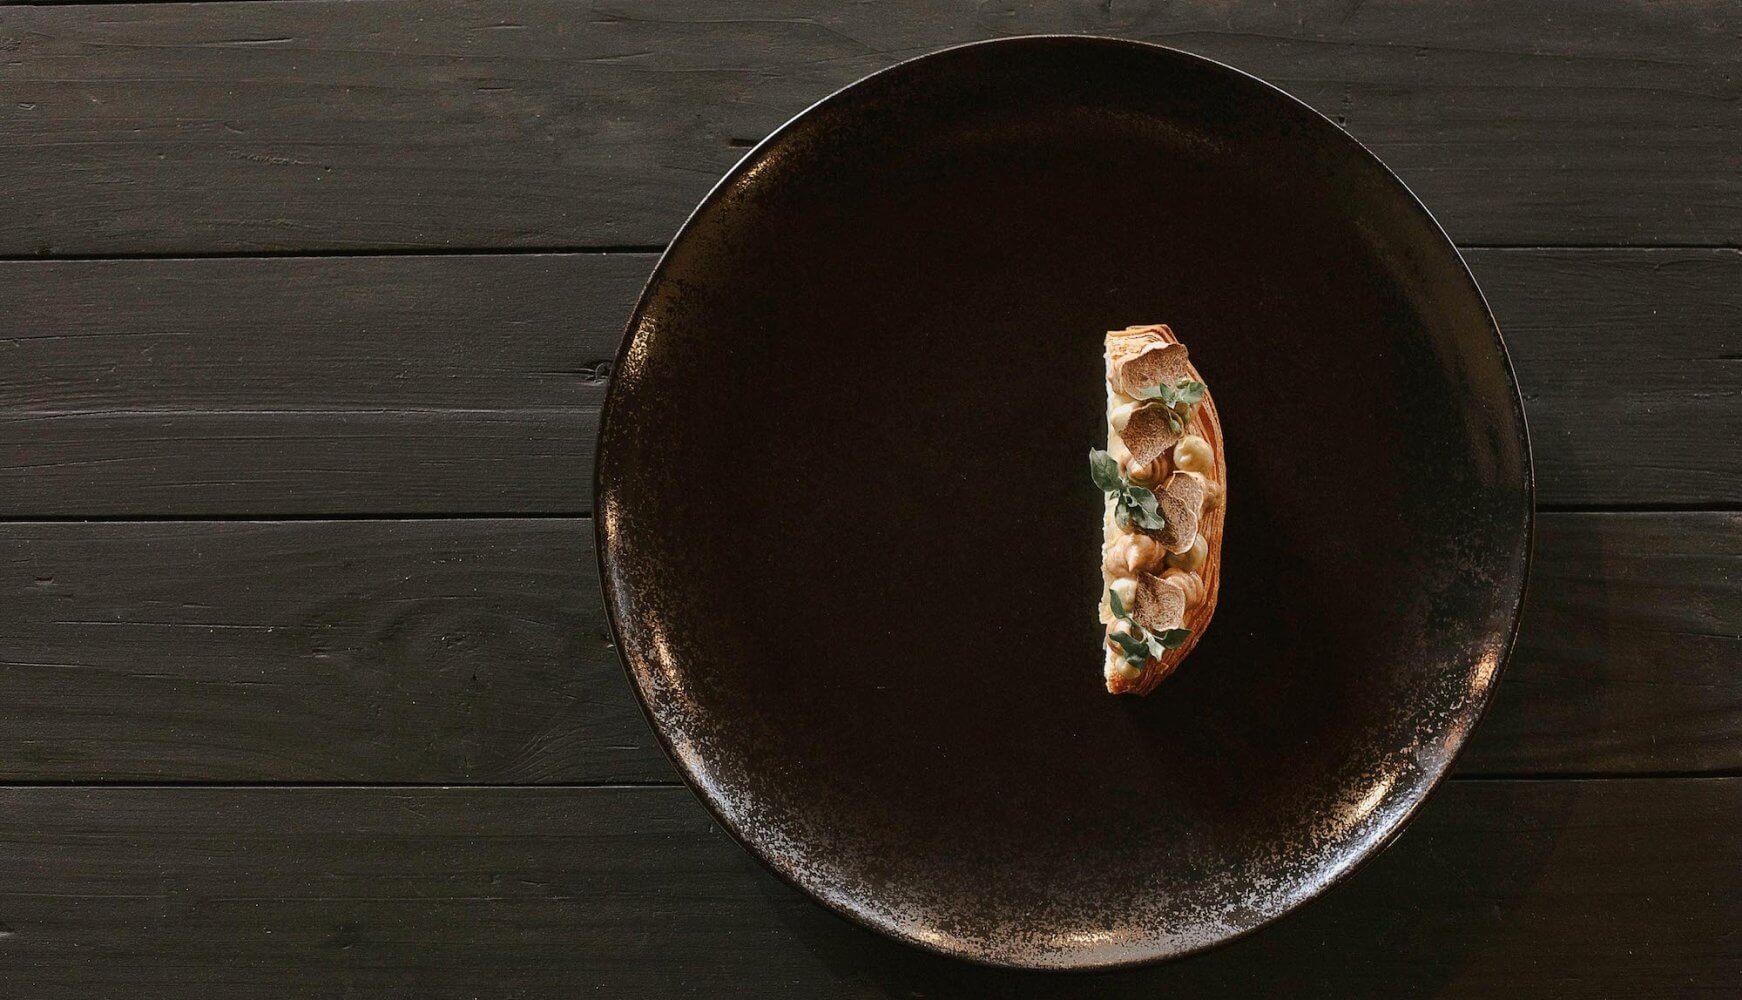 mille feuille, jajčevec in črni tartuf